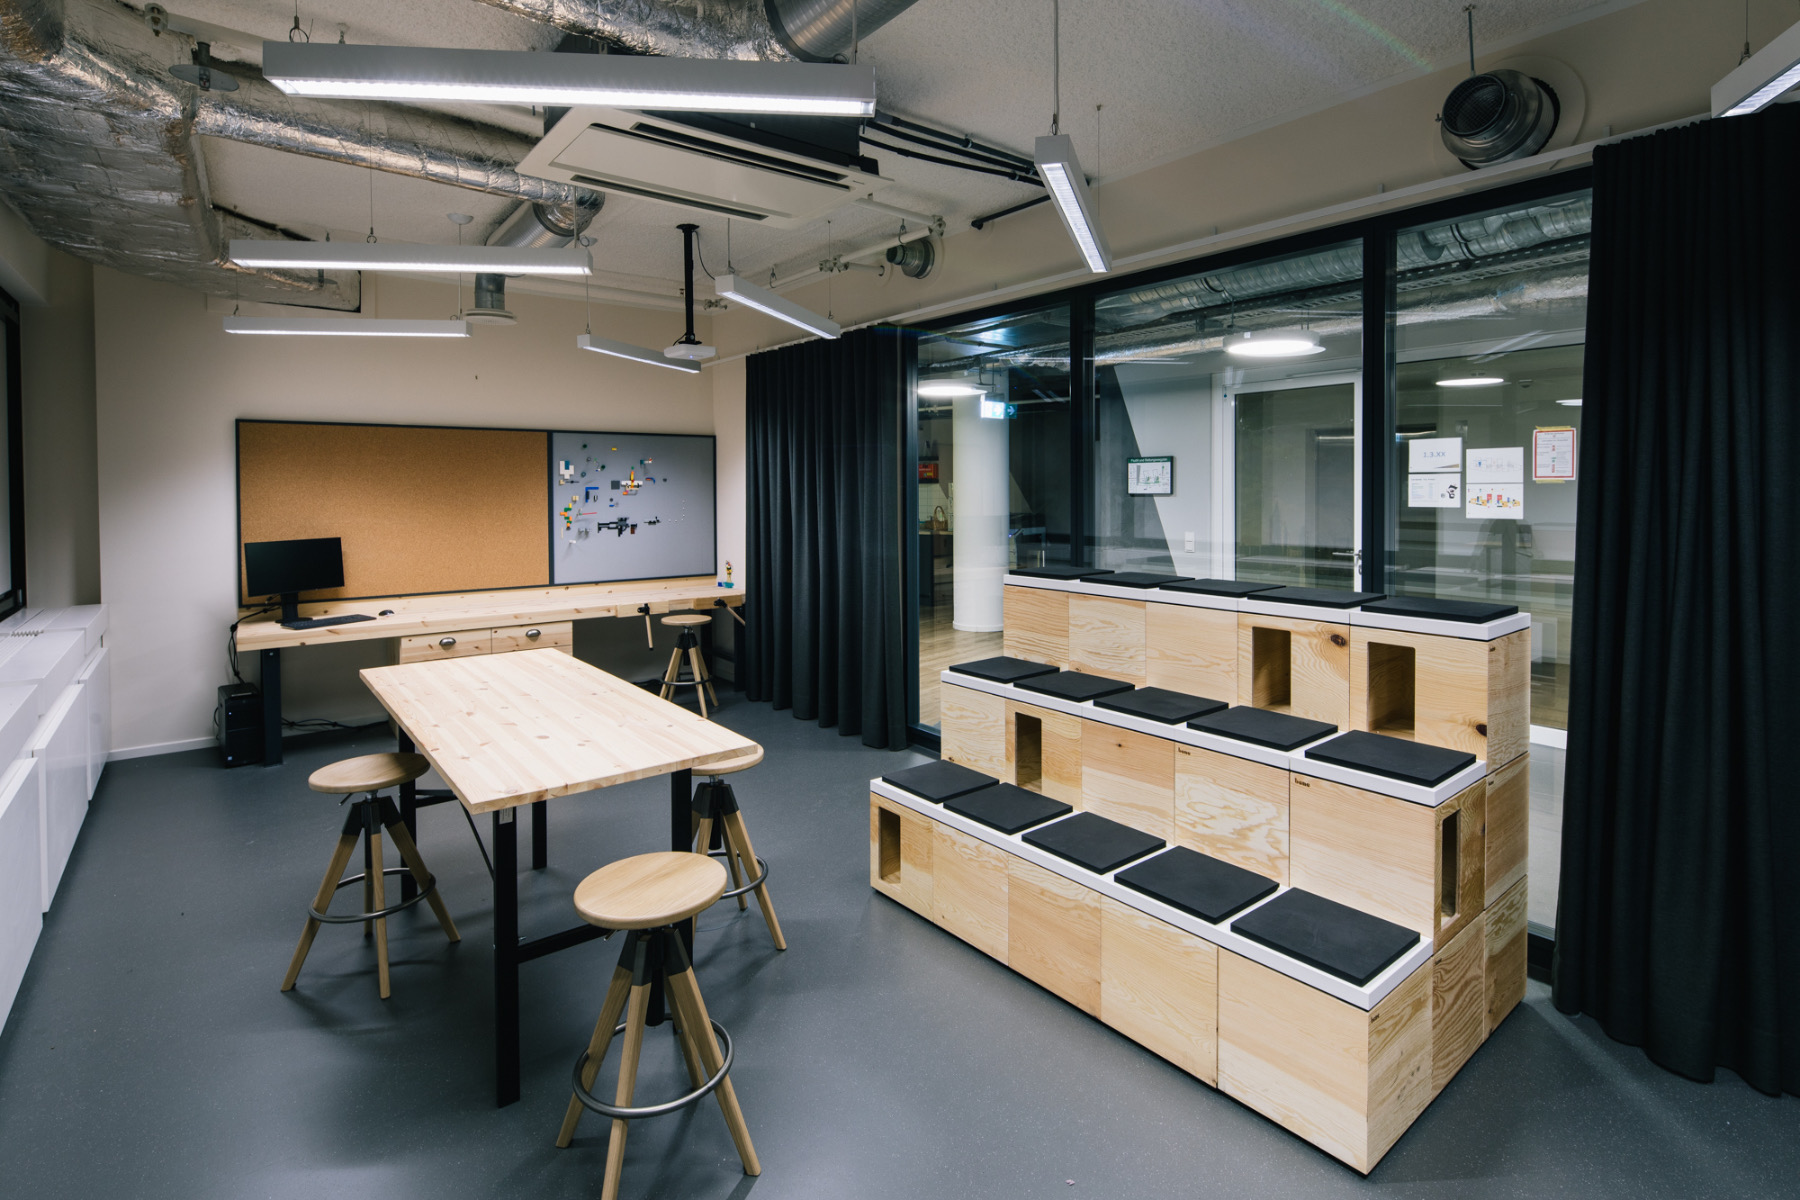 ubisoft-dusseldorf-office-7